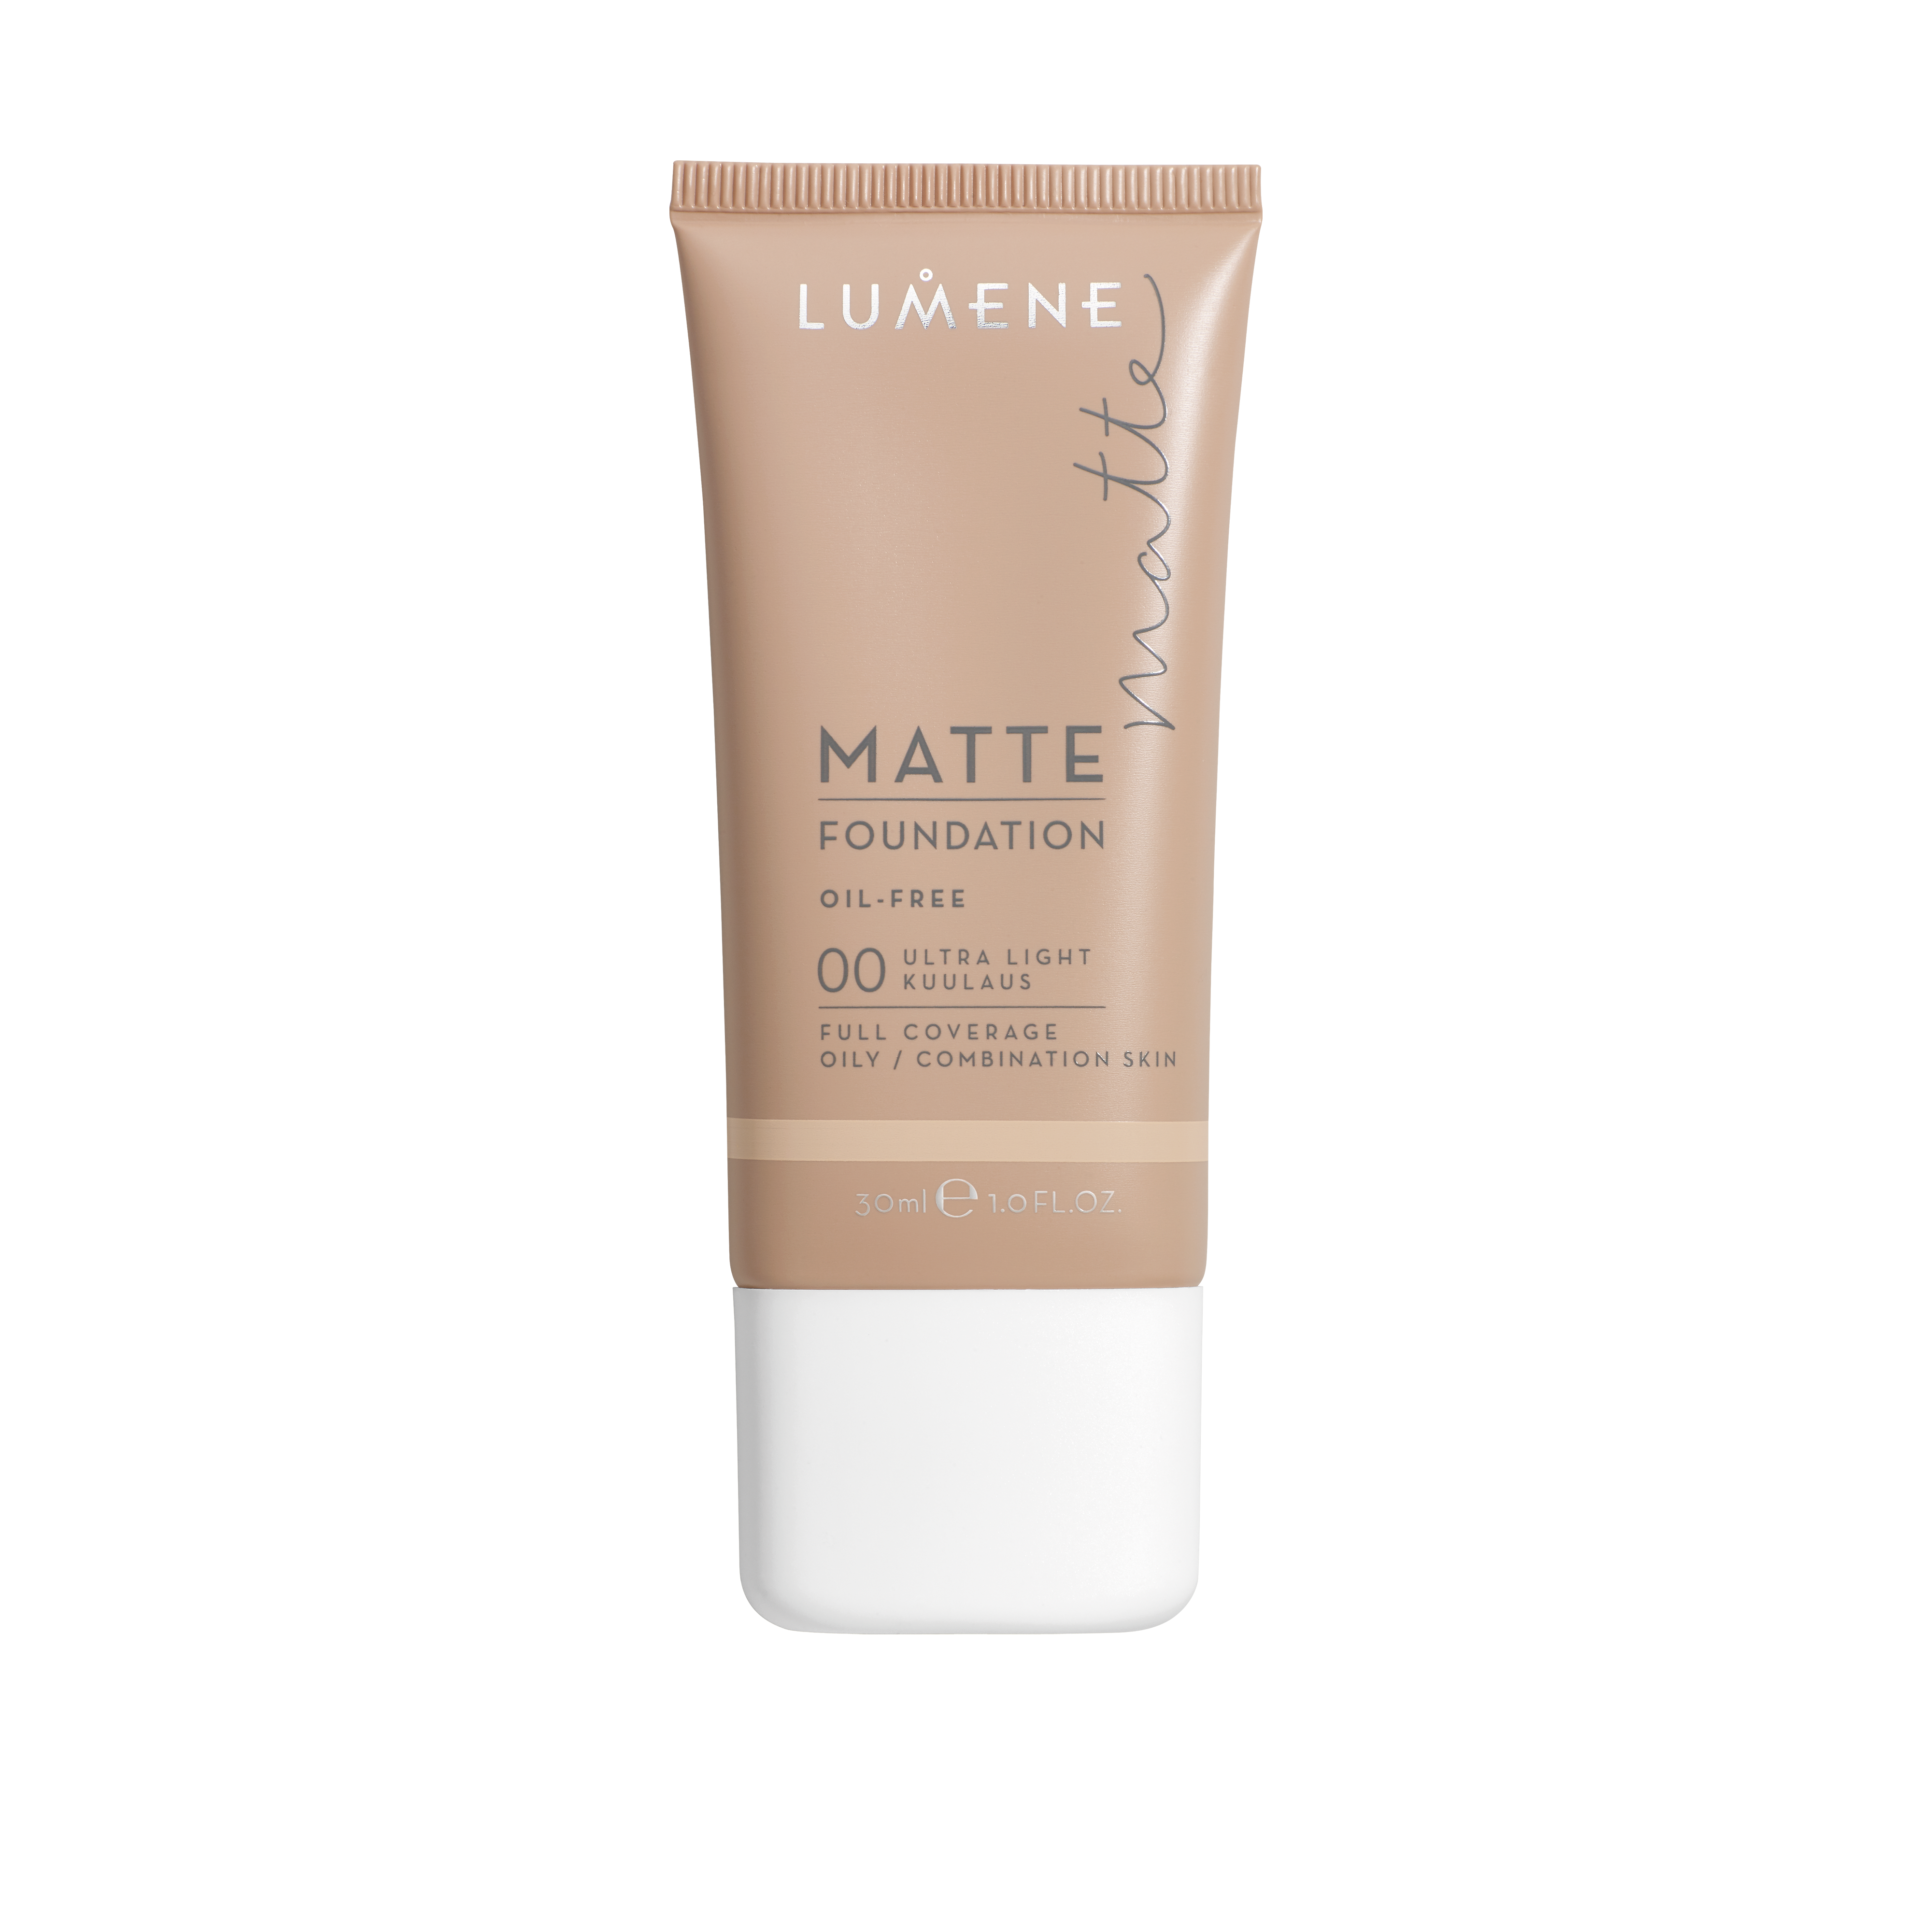 Matte Foundation 00 Ultra Light